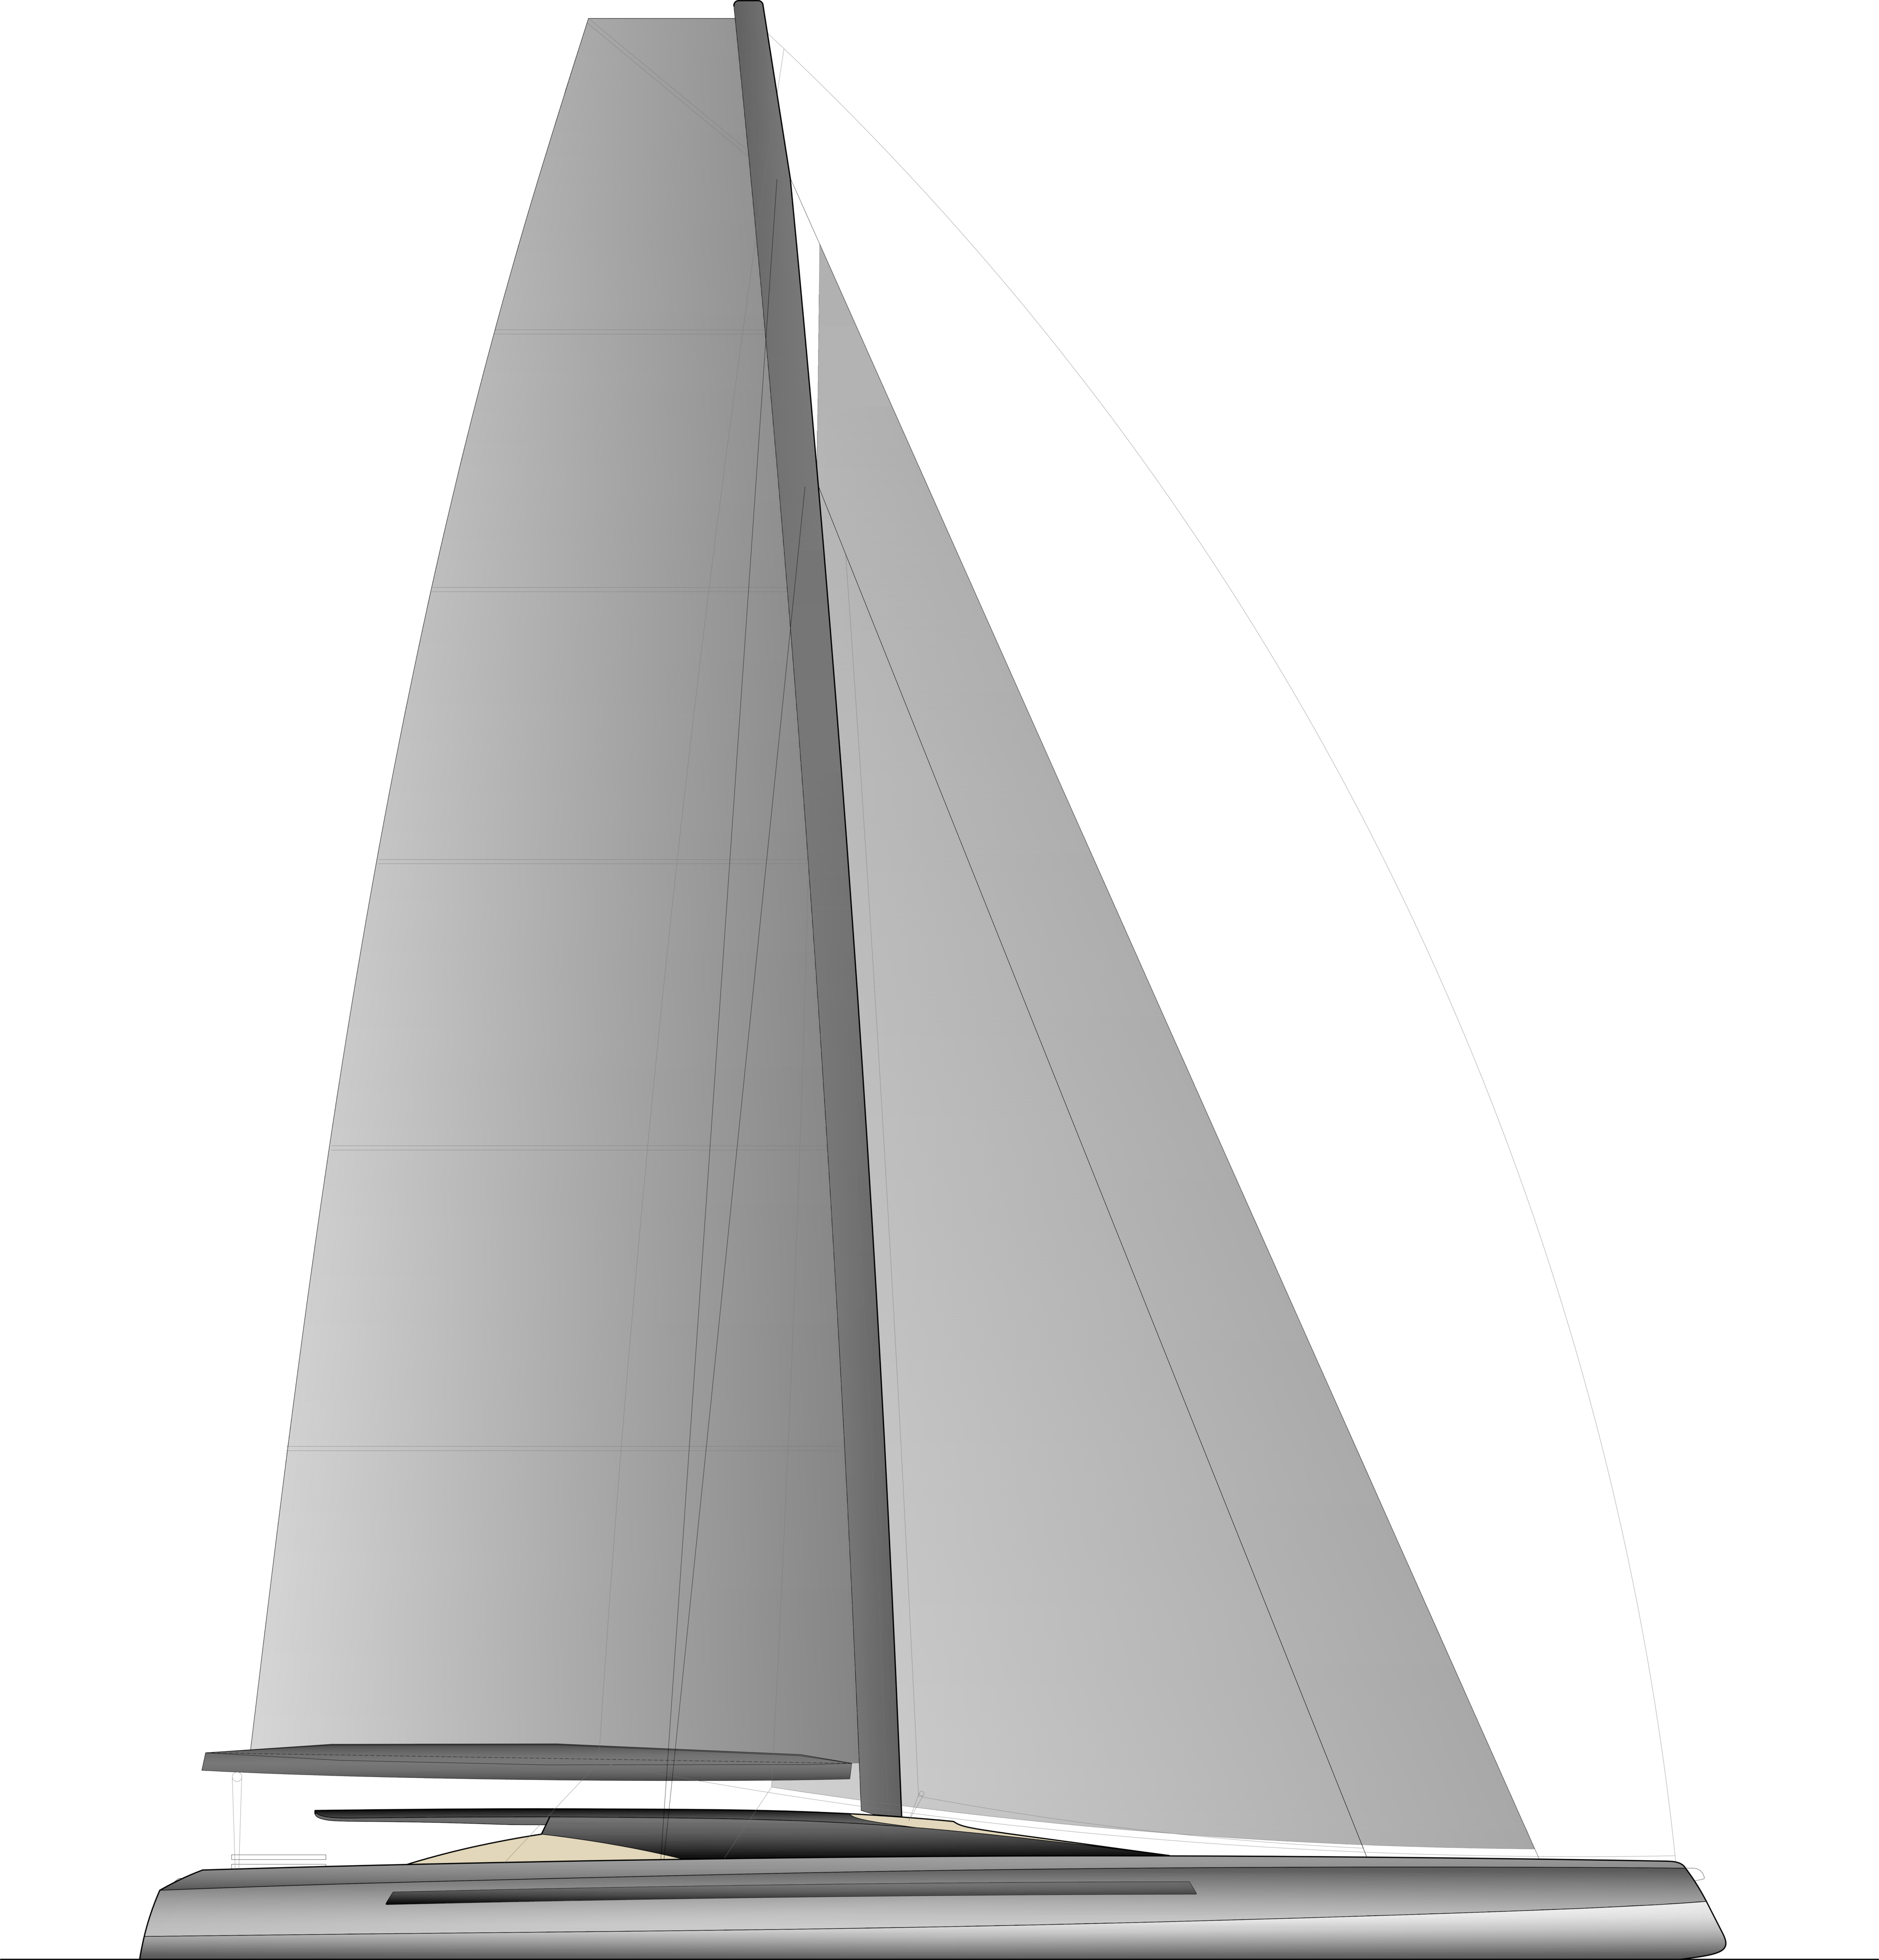 MMYD_033_Black Cat_Sail Plan_2_Brochure.png